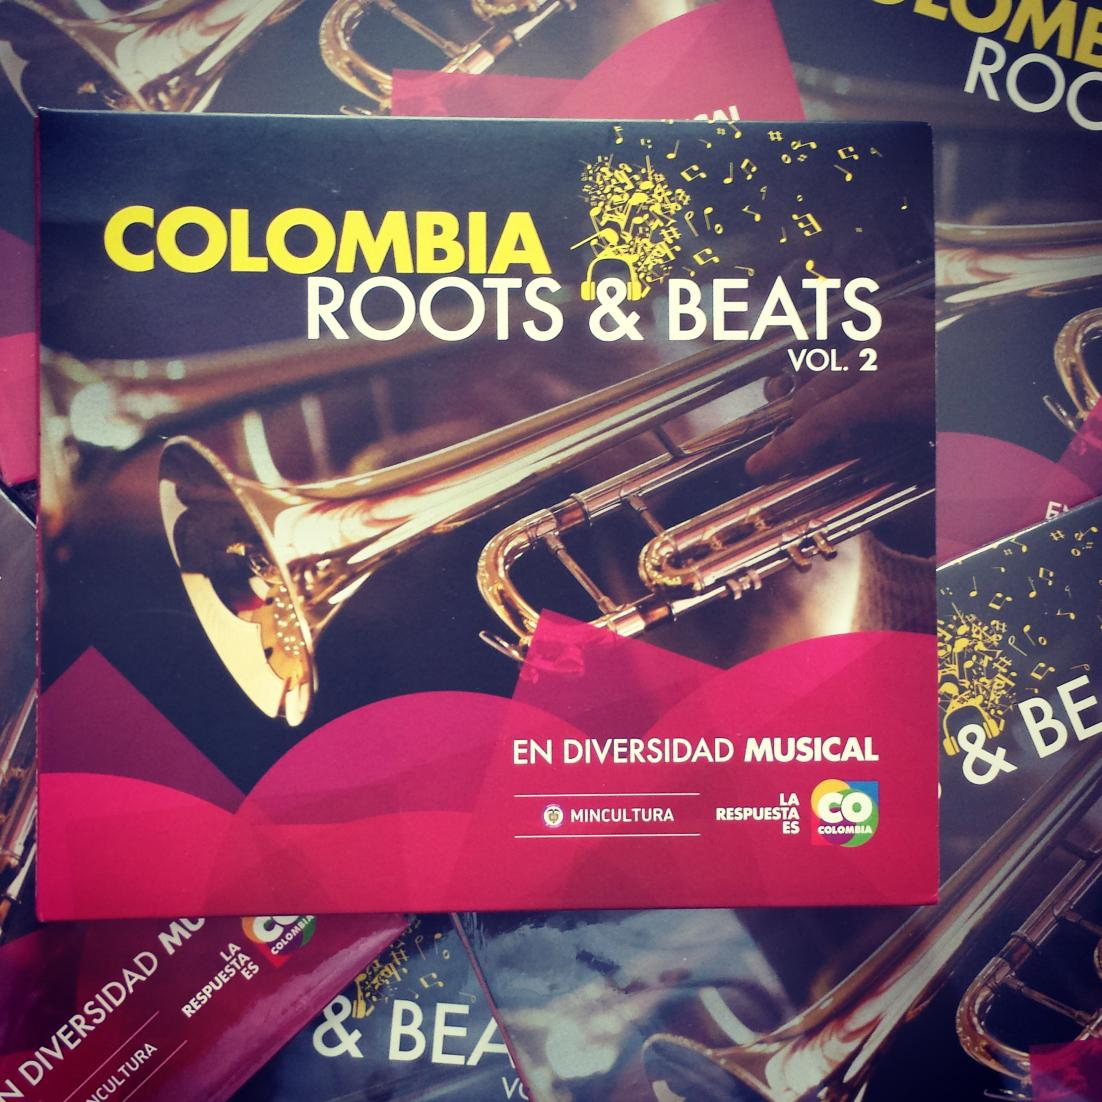 La música de 17 artistas sonará en #Colombiaenwomex15 Escúchalos en: http://t.co/J8nyUShArw @EmprendCultural @womex http://t.co/UYfUkE7Qxh